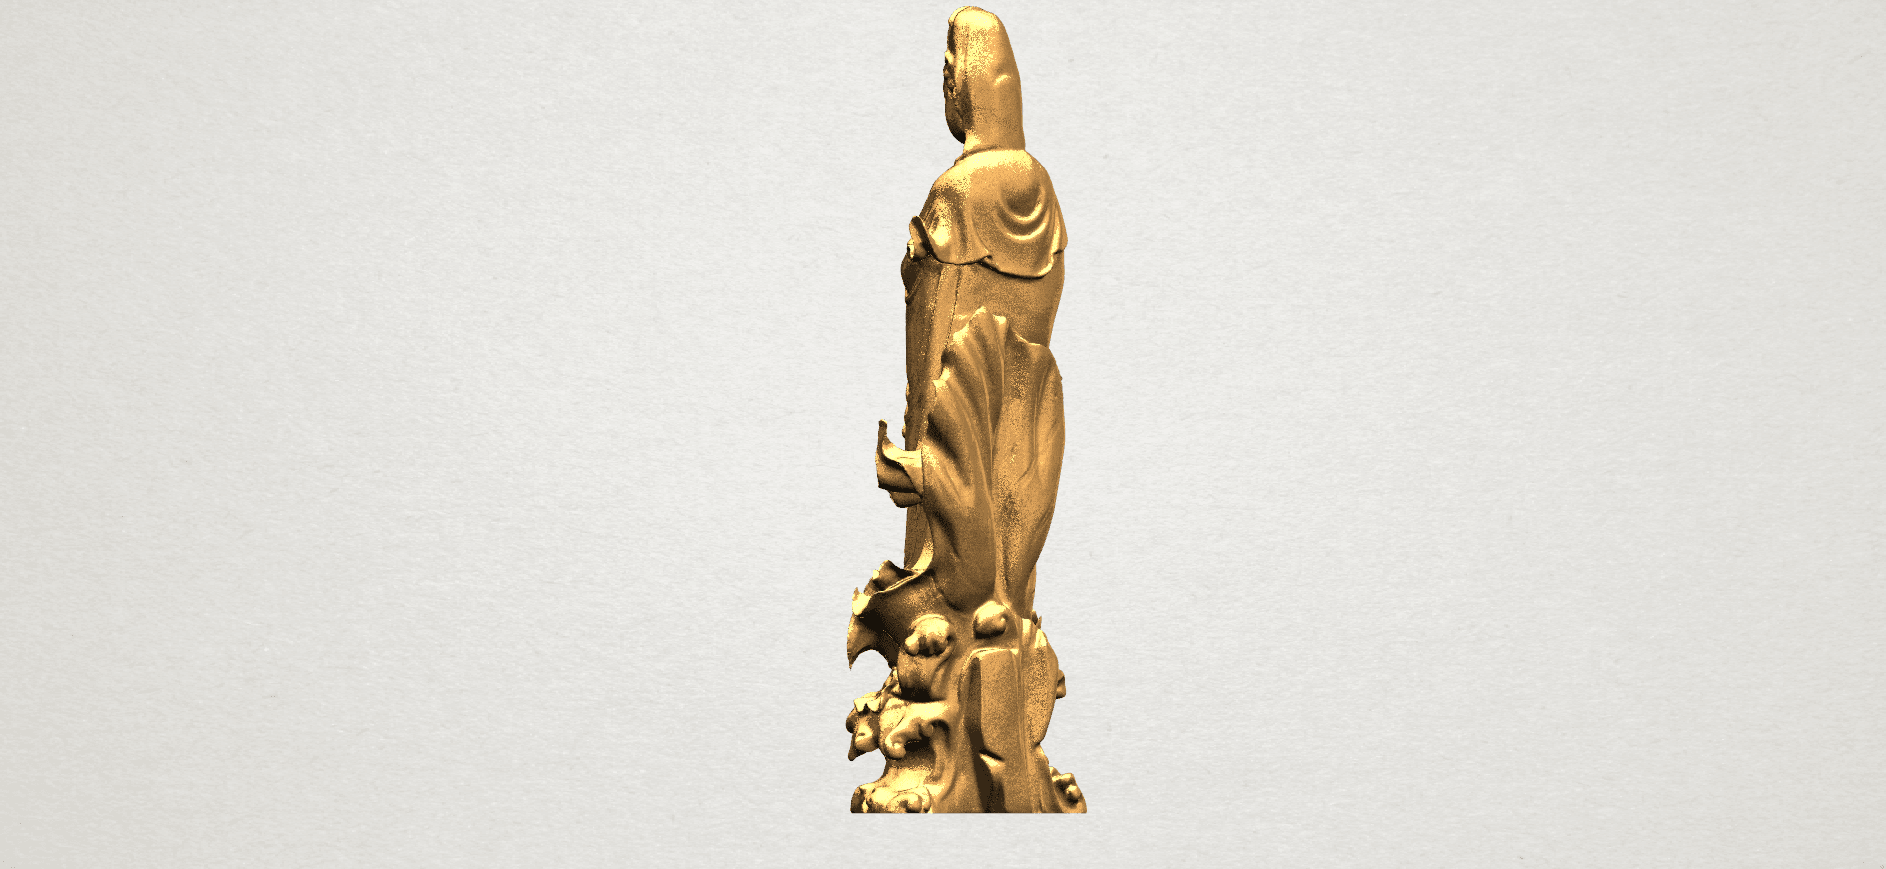 Avalokitesvara Buddha  award kid (i) A05.png Download free STL file Avalokitesvara Bodhisattva - award kid 01 • 3D print object, GeorgesNikkei